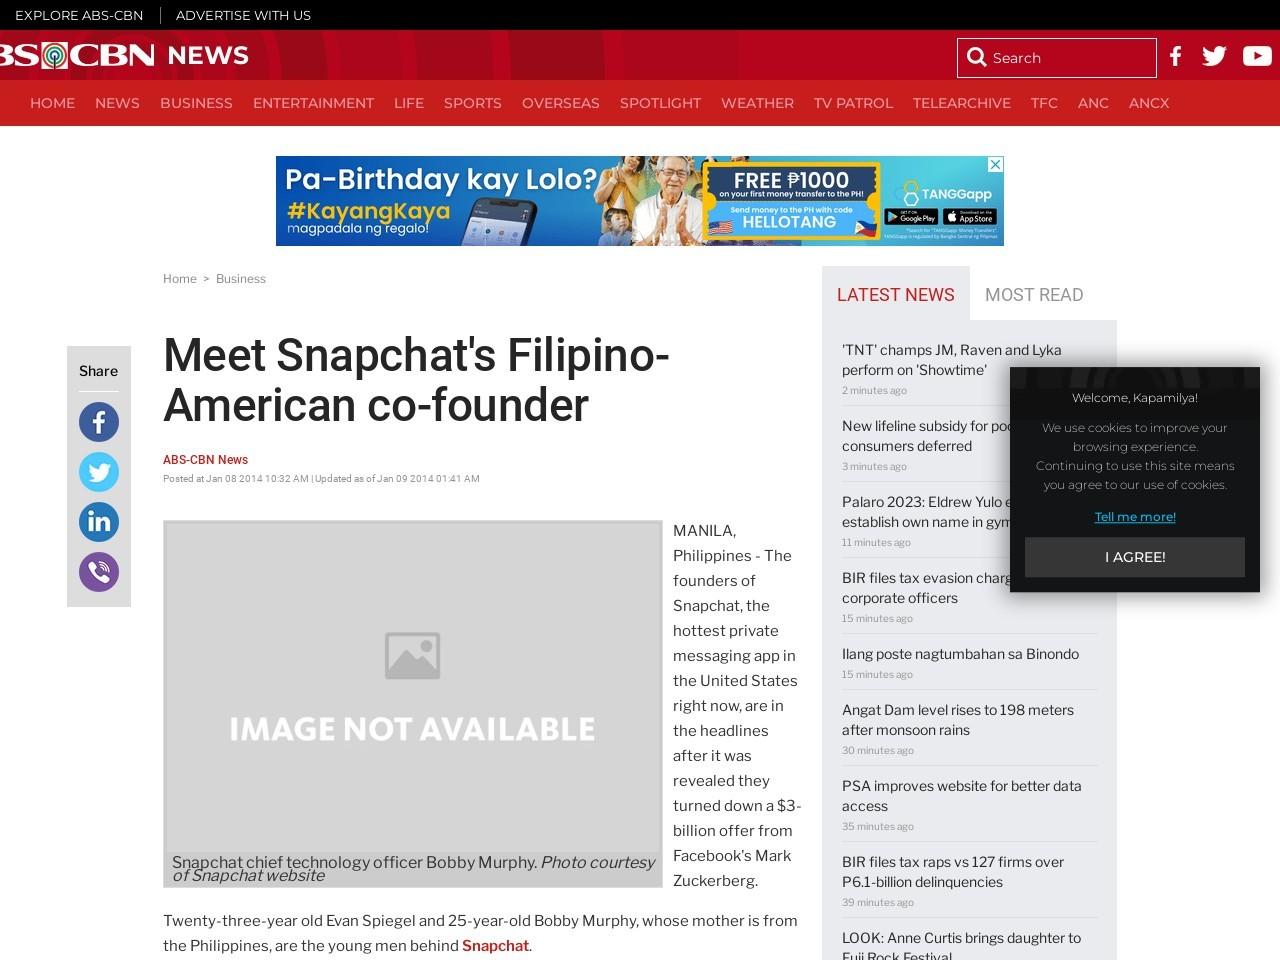 Meet Snapchat's Filipino-American co-founder